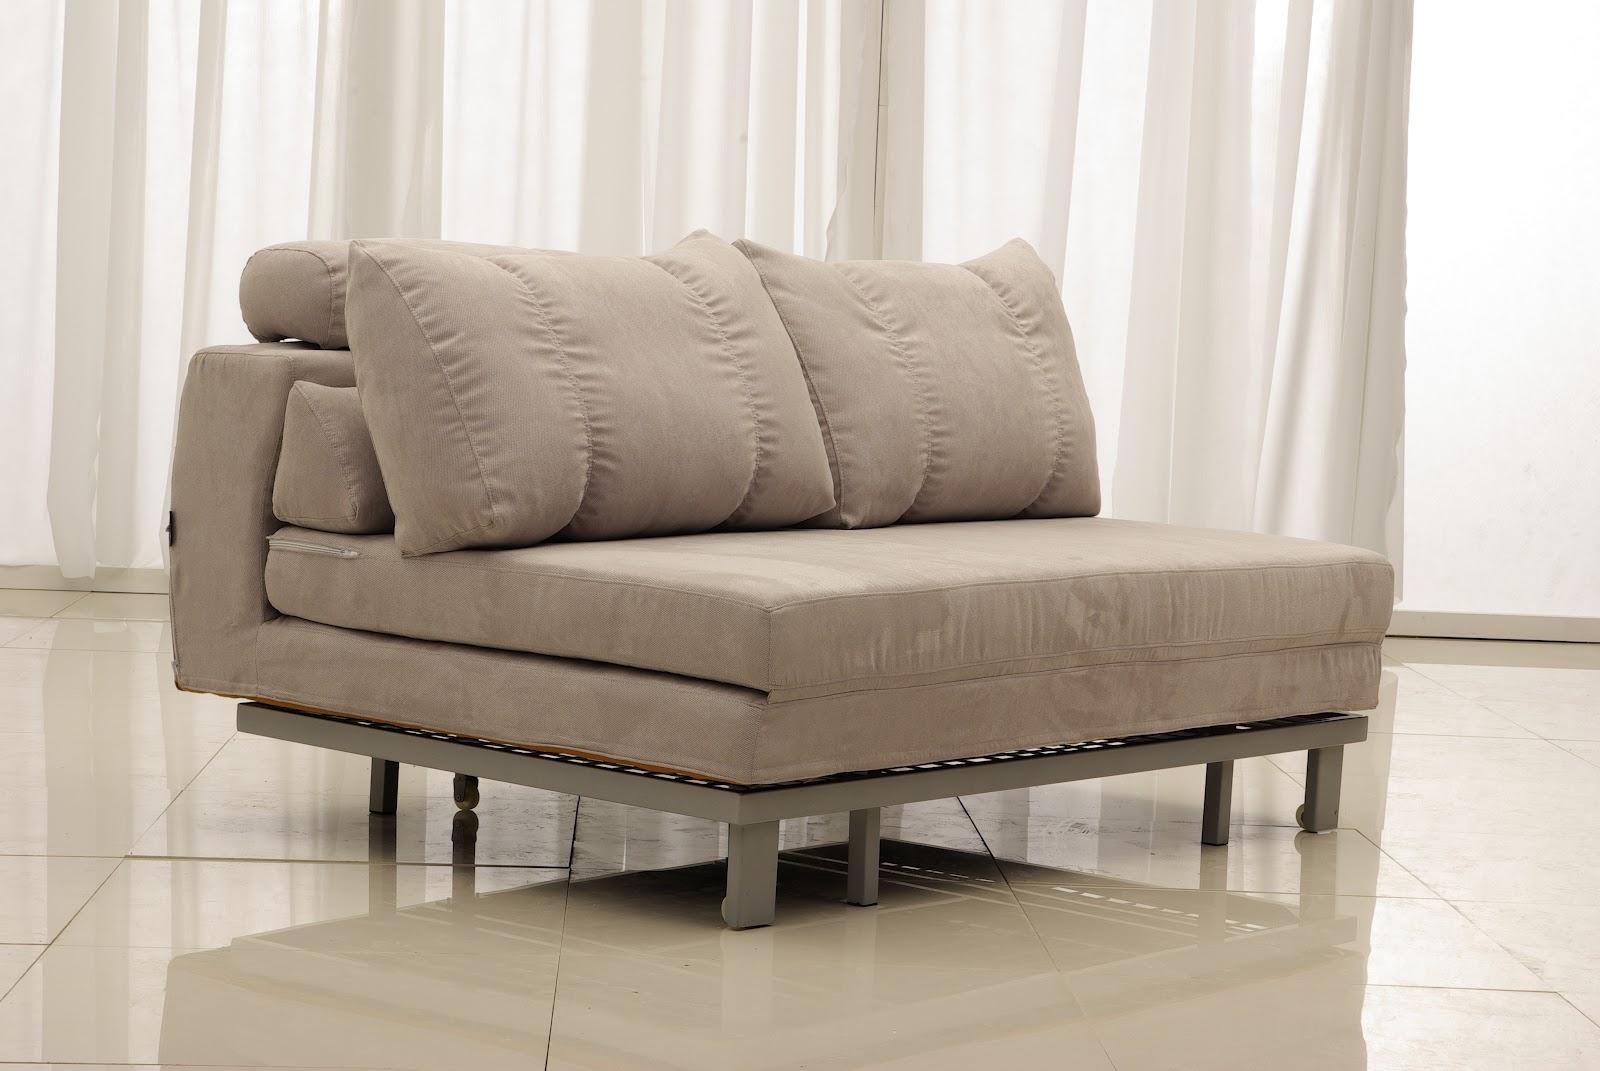 comfortable single couch wildwoodsta com nice single sofa sleeper barrymore furniture ens bed